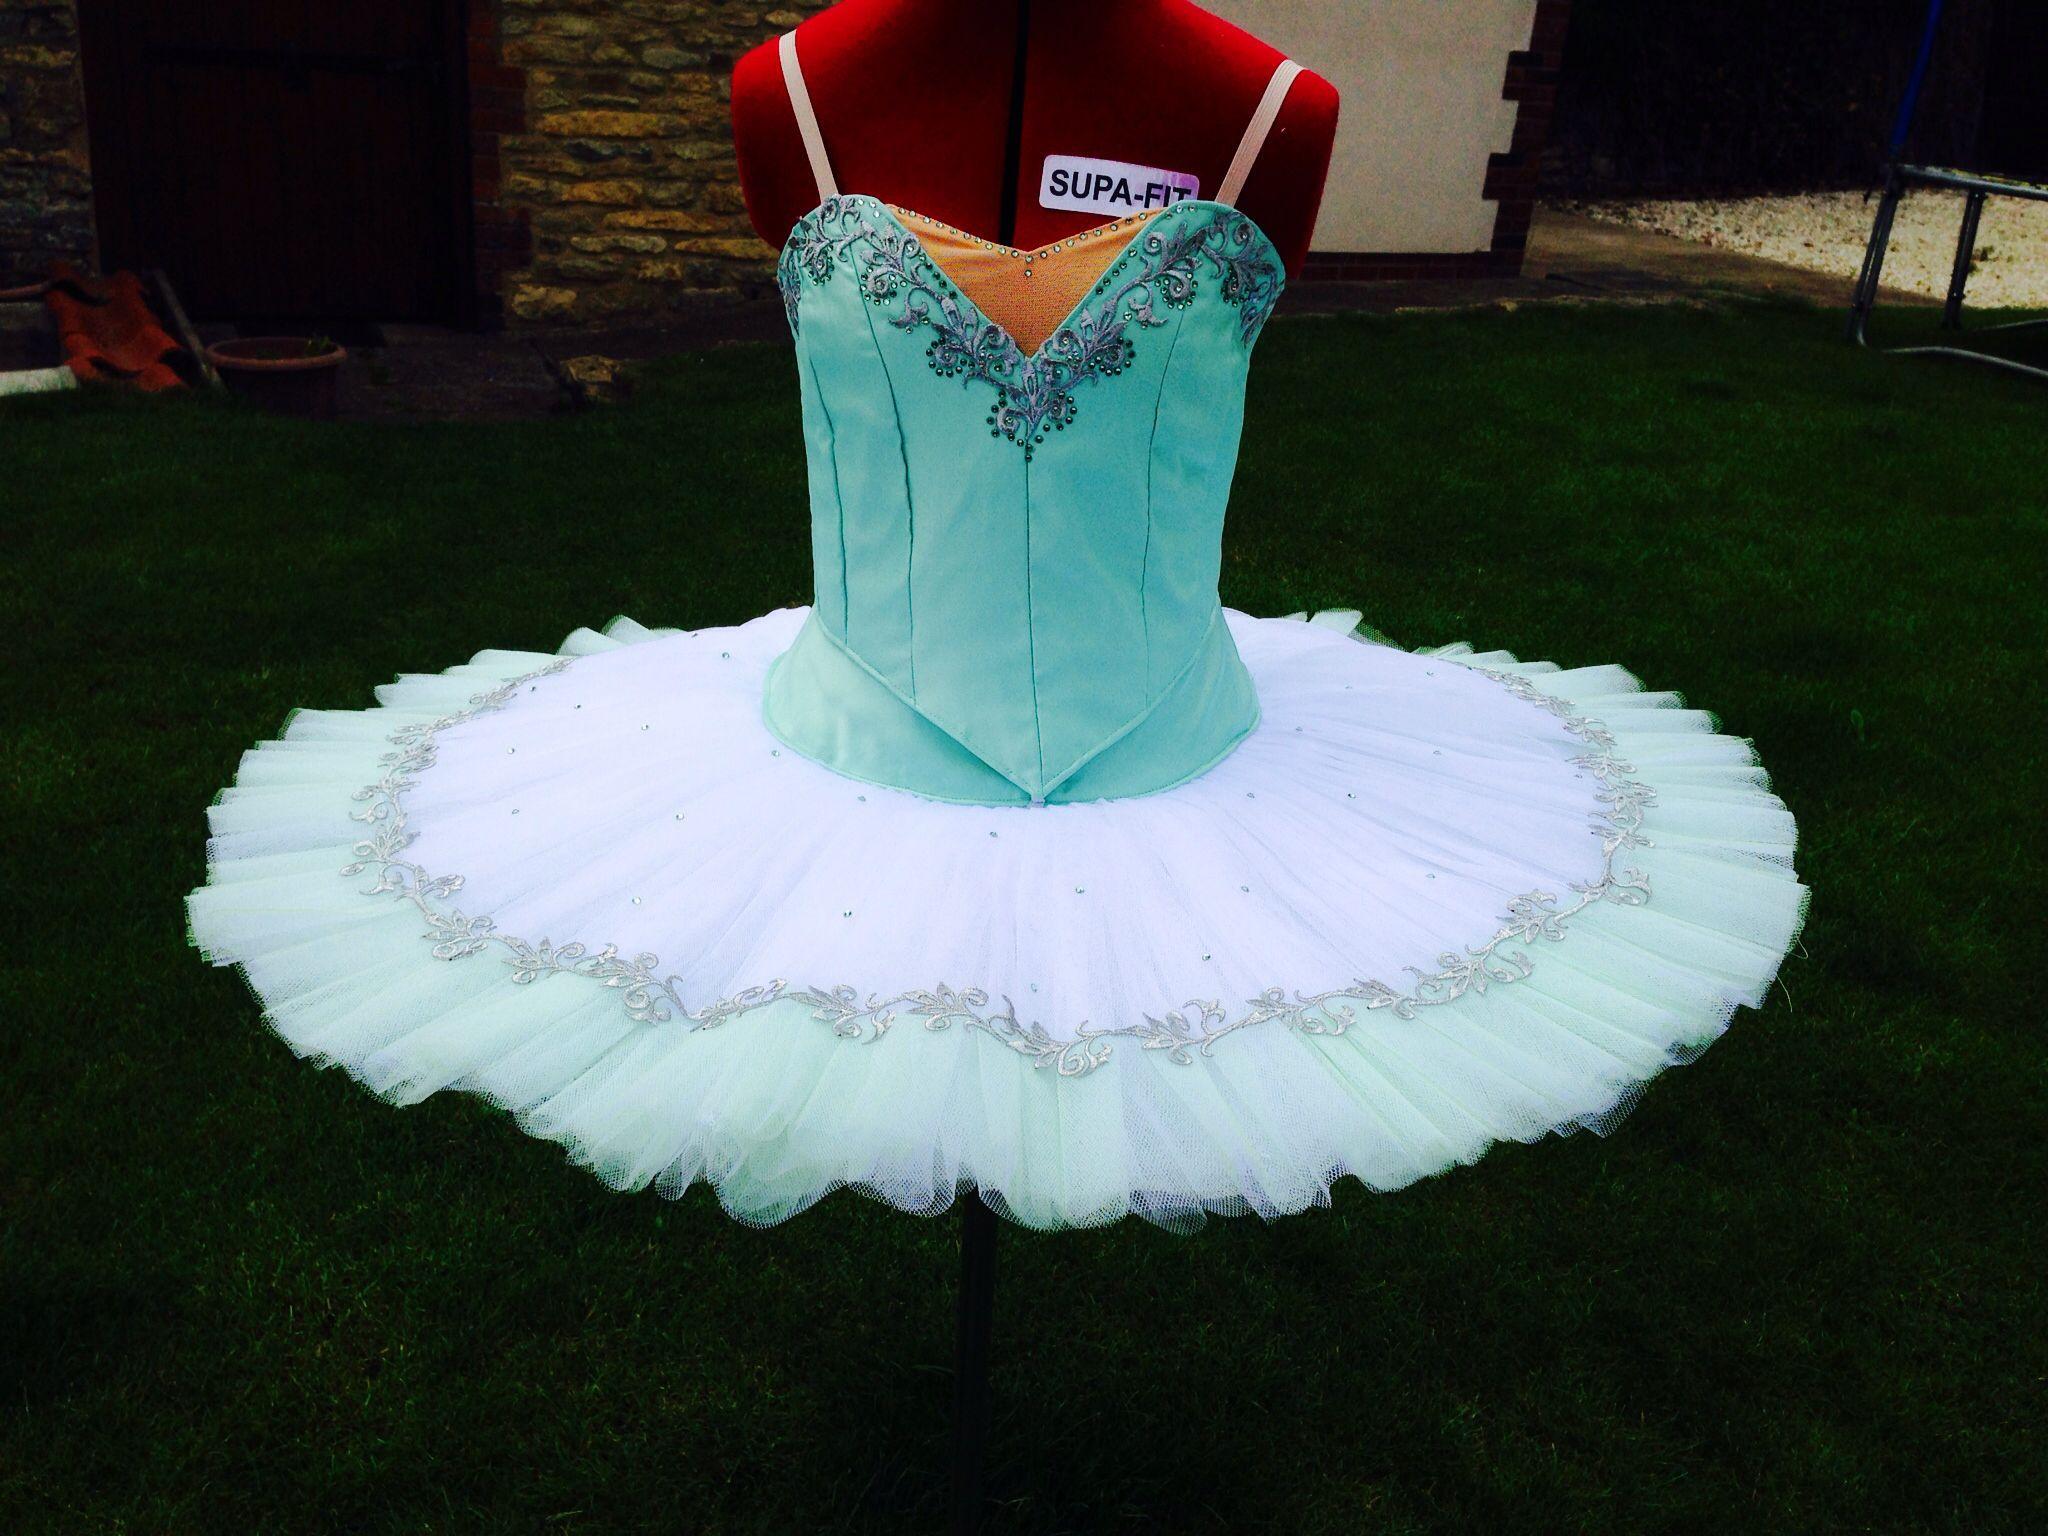 a96d0fe0c2964 Mint green ballet tutu pancake skirt. Made by Sewn by Sara Ballet Tutus.